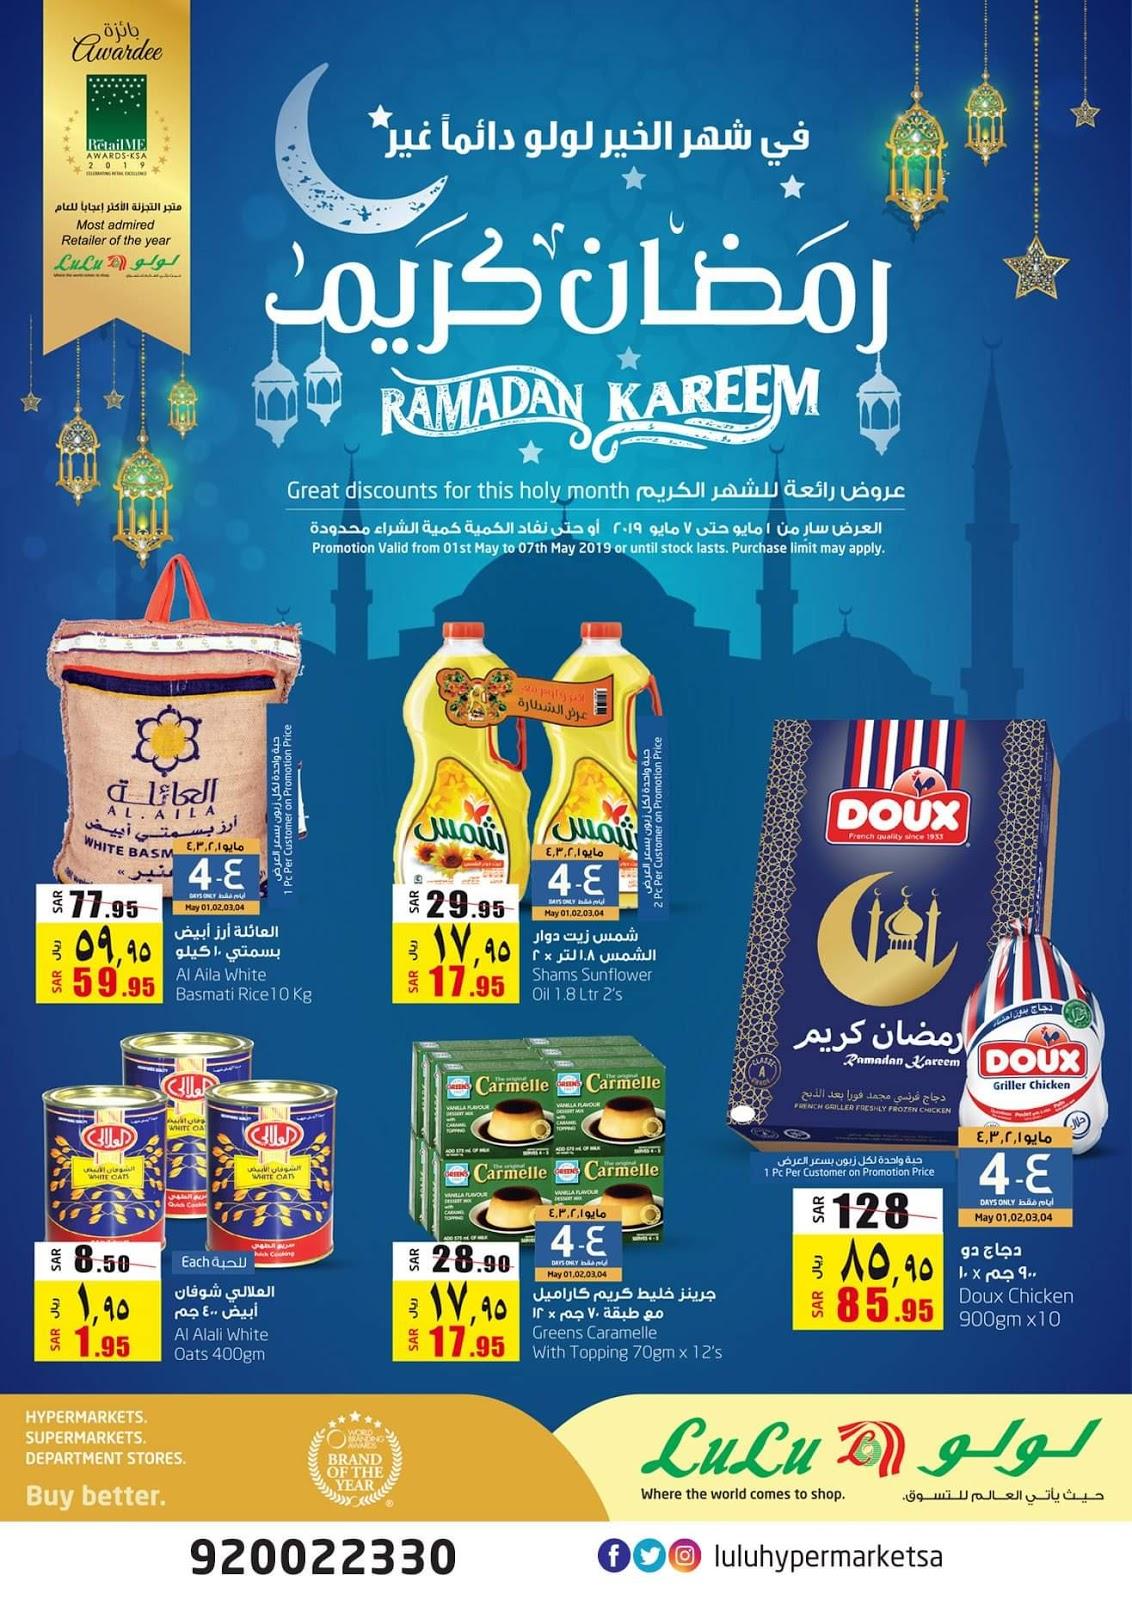 463e30dab عروض لولو Lulu الرياض وحائل والخرج رمضان كريم من 1 و حتى 7 مايو